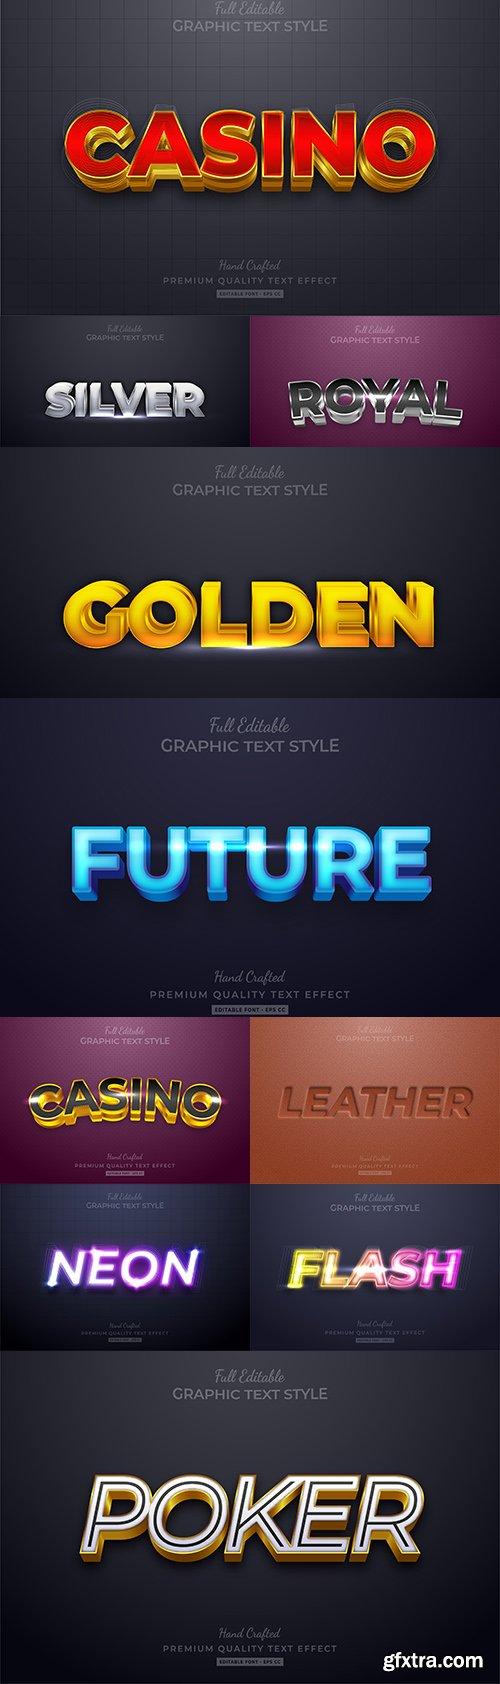 Editable font effect text collection illustration design 205